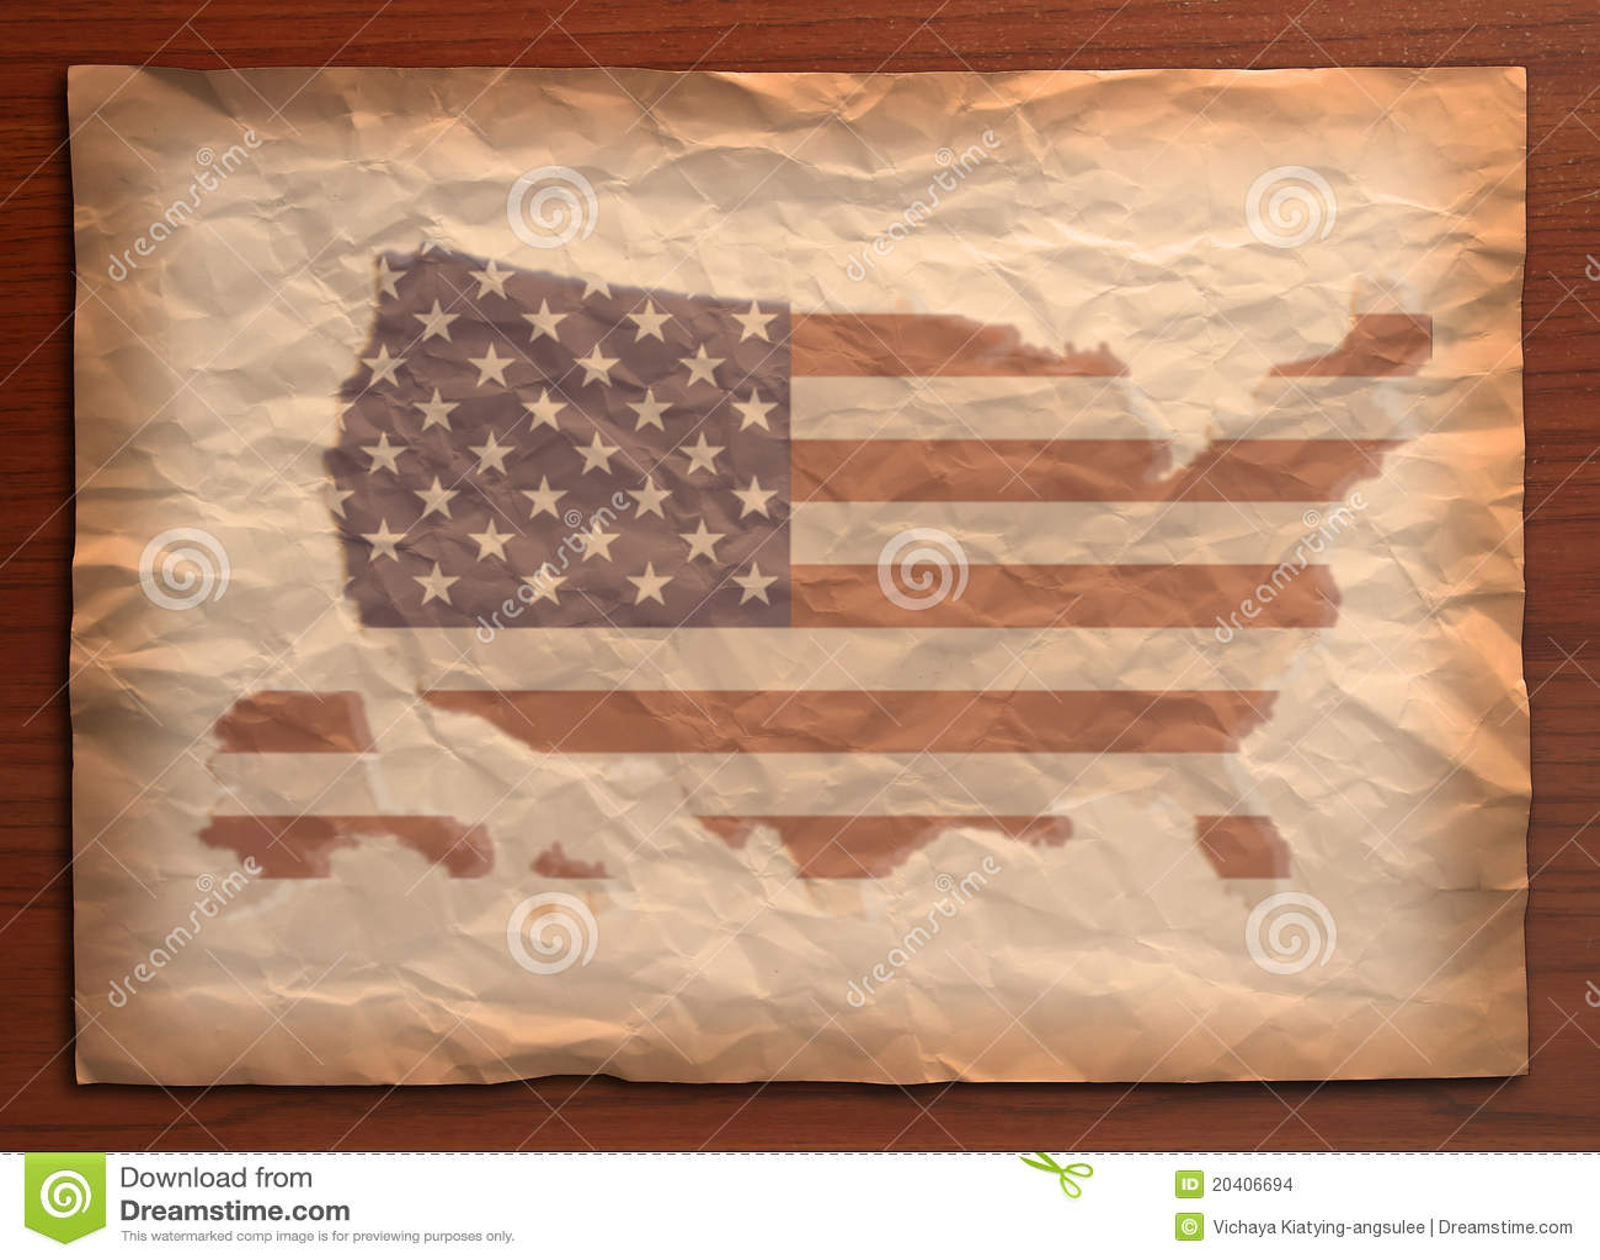 Vintage Usa Map On Paper Craft Stock Illustration - Illustration of ...